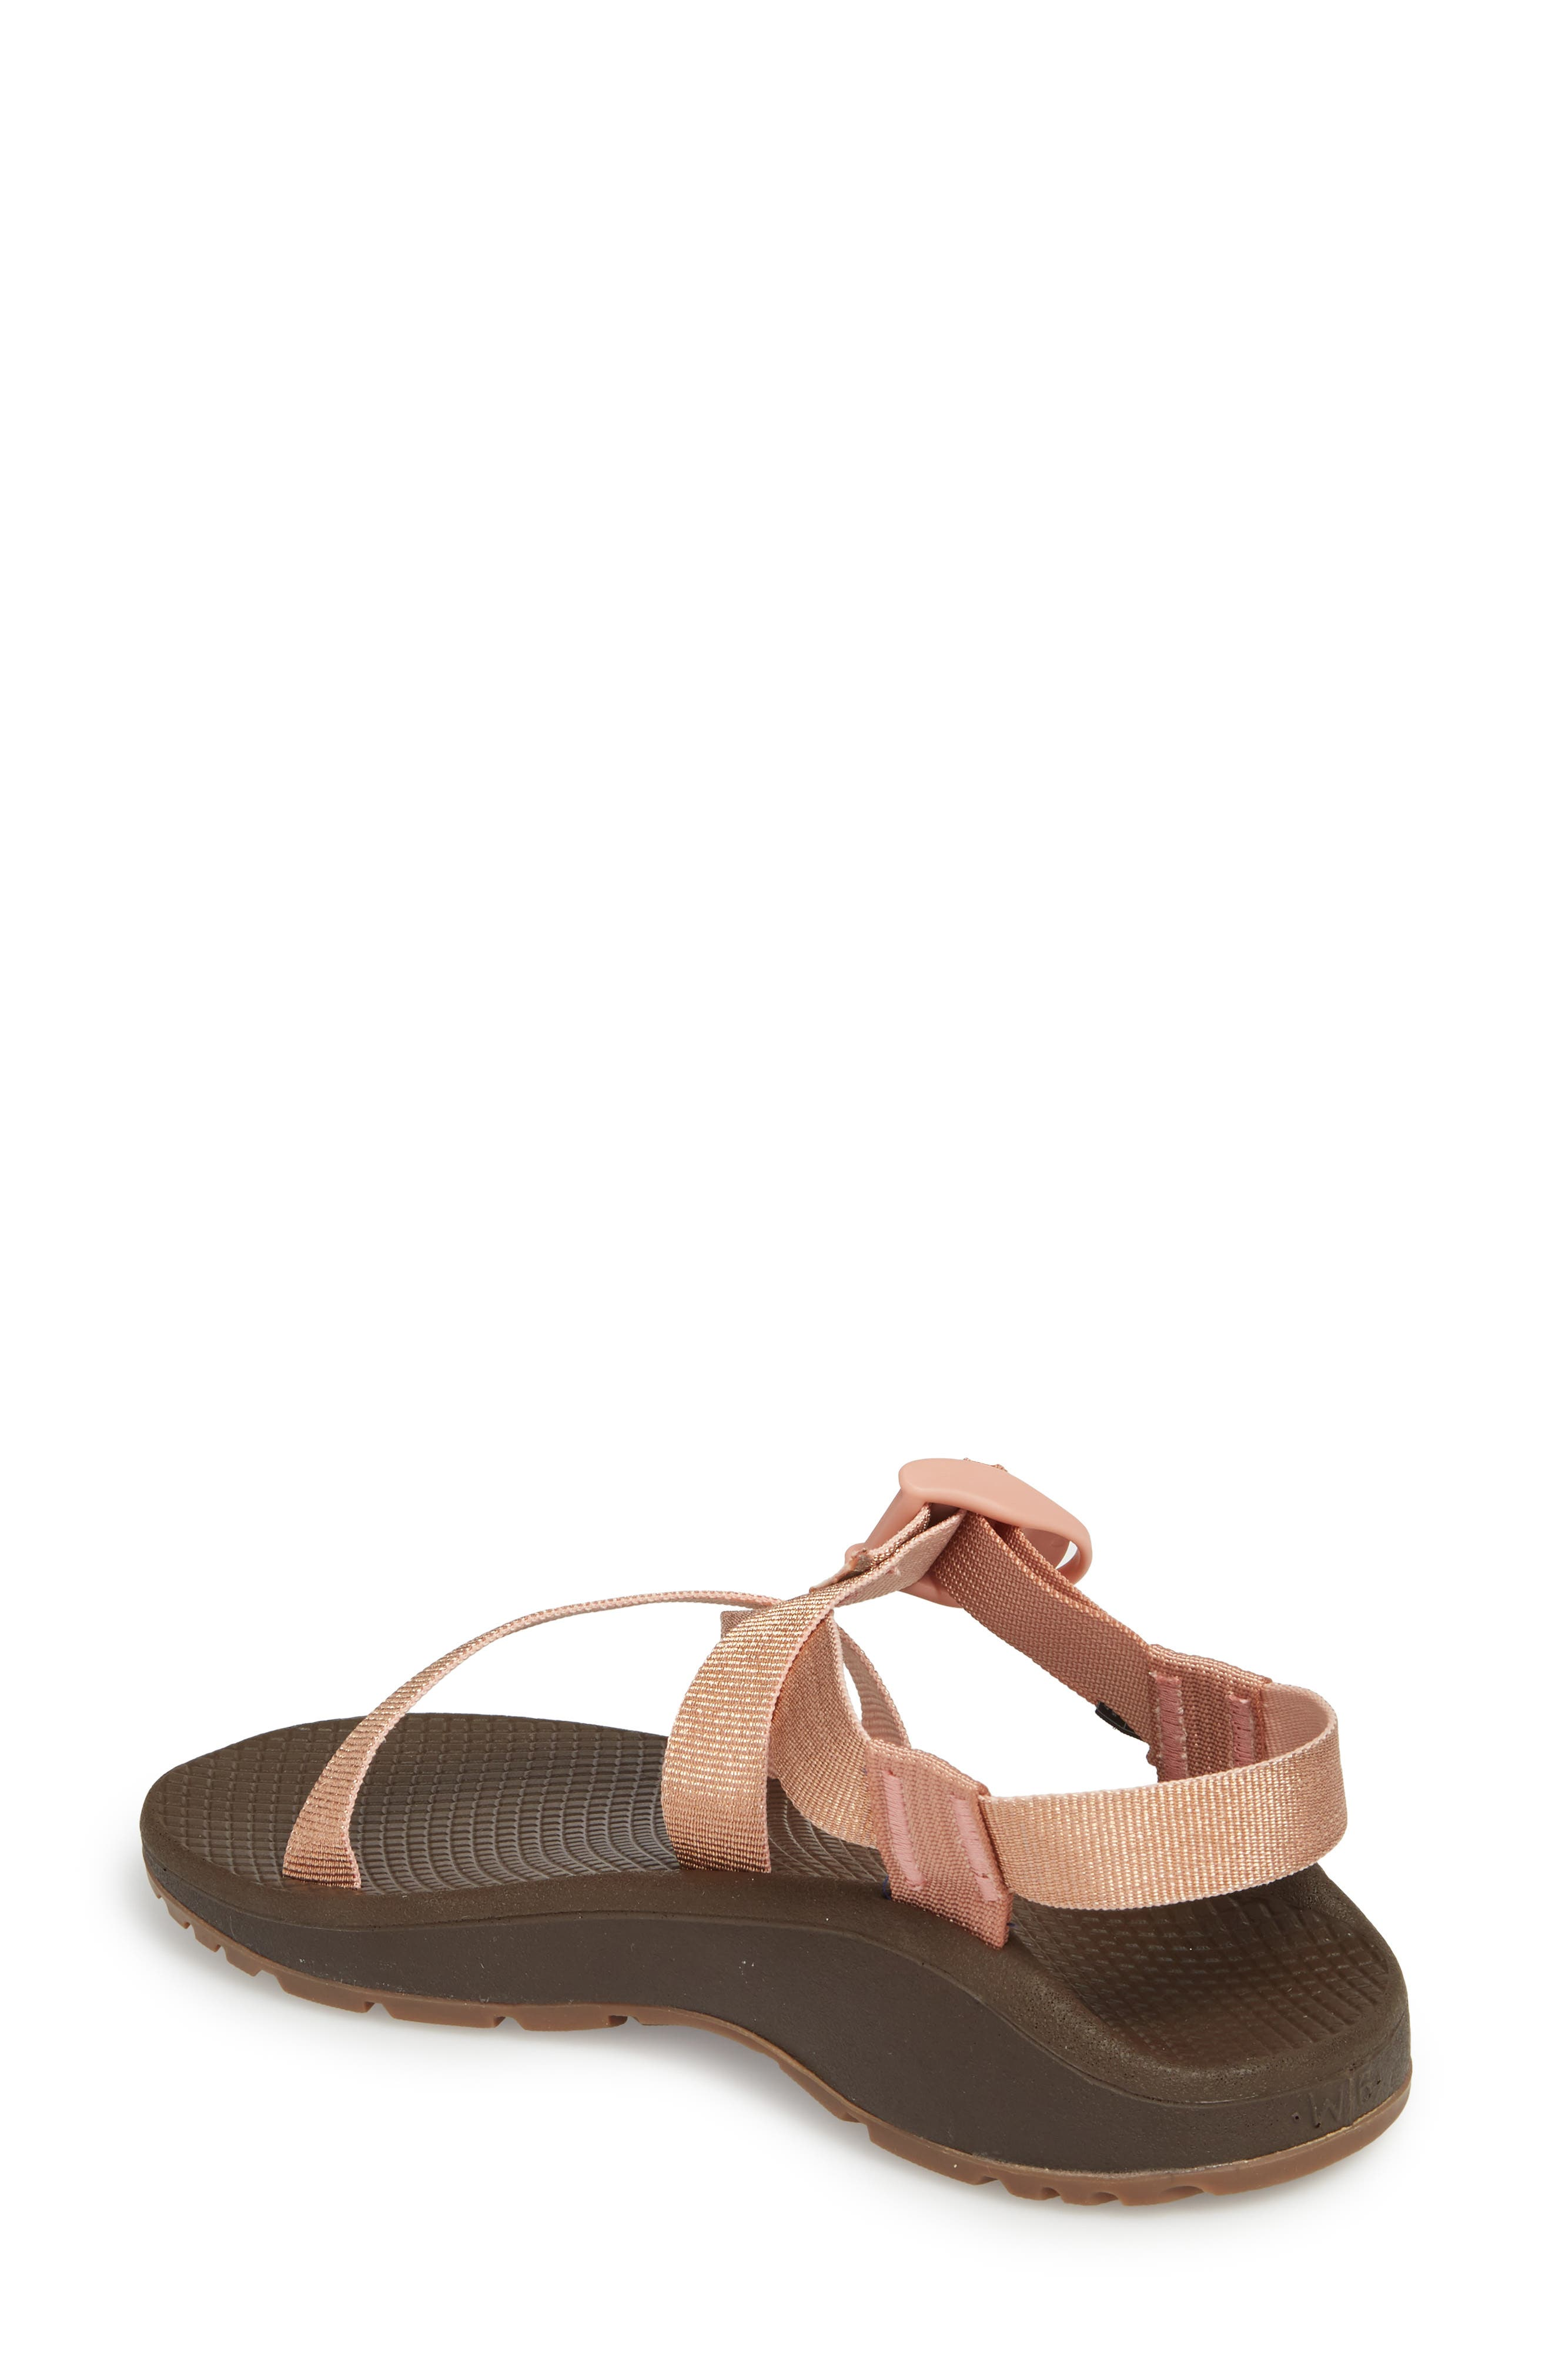 Z/Cloud Sandal,                             Alternate thumbnail 2, color,                             Metallic Rose Leather